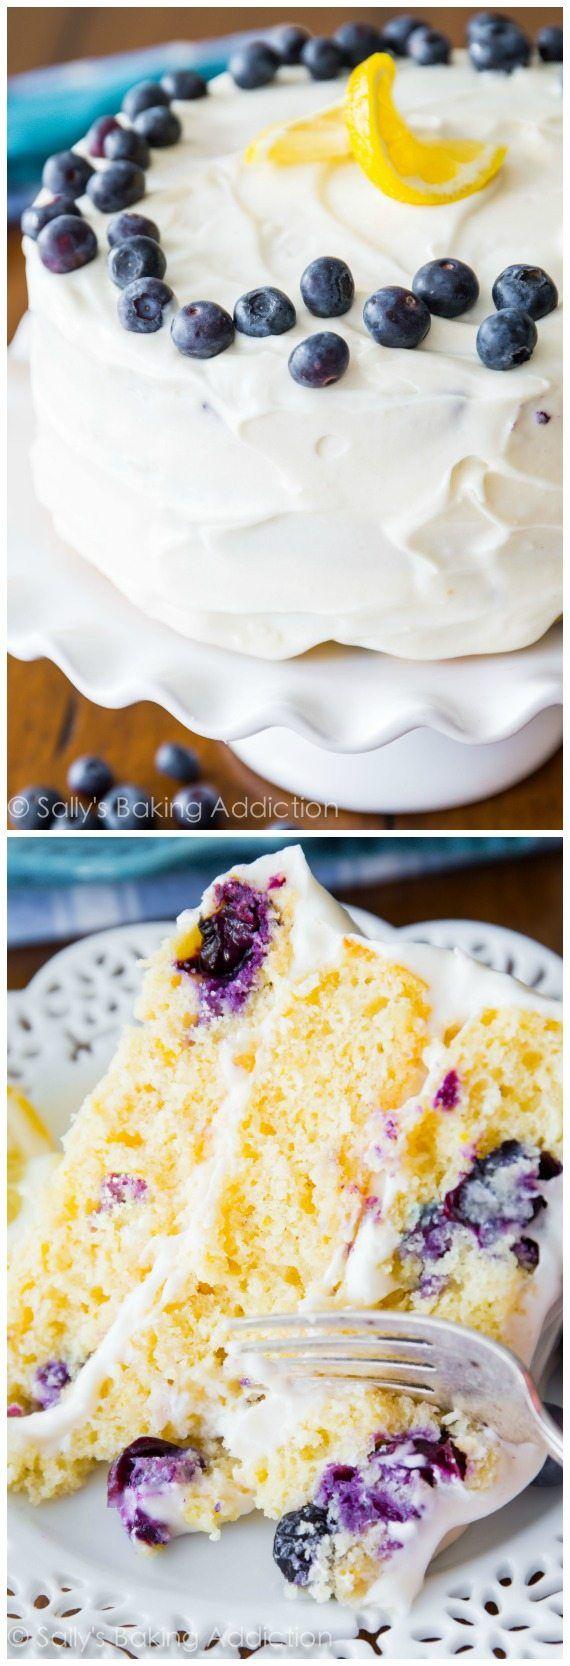 Sally's Baking Addiction   Delicious Lemon Blueberry Layer Cake!